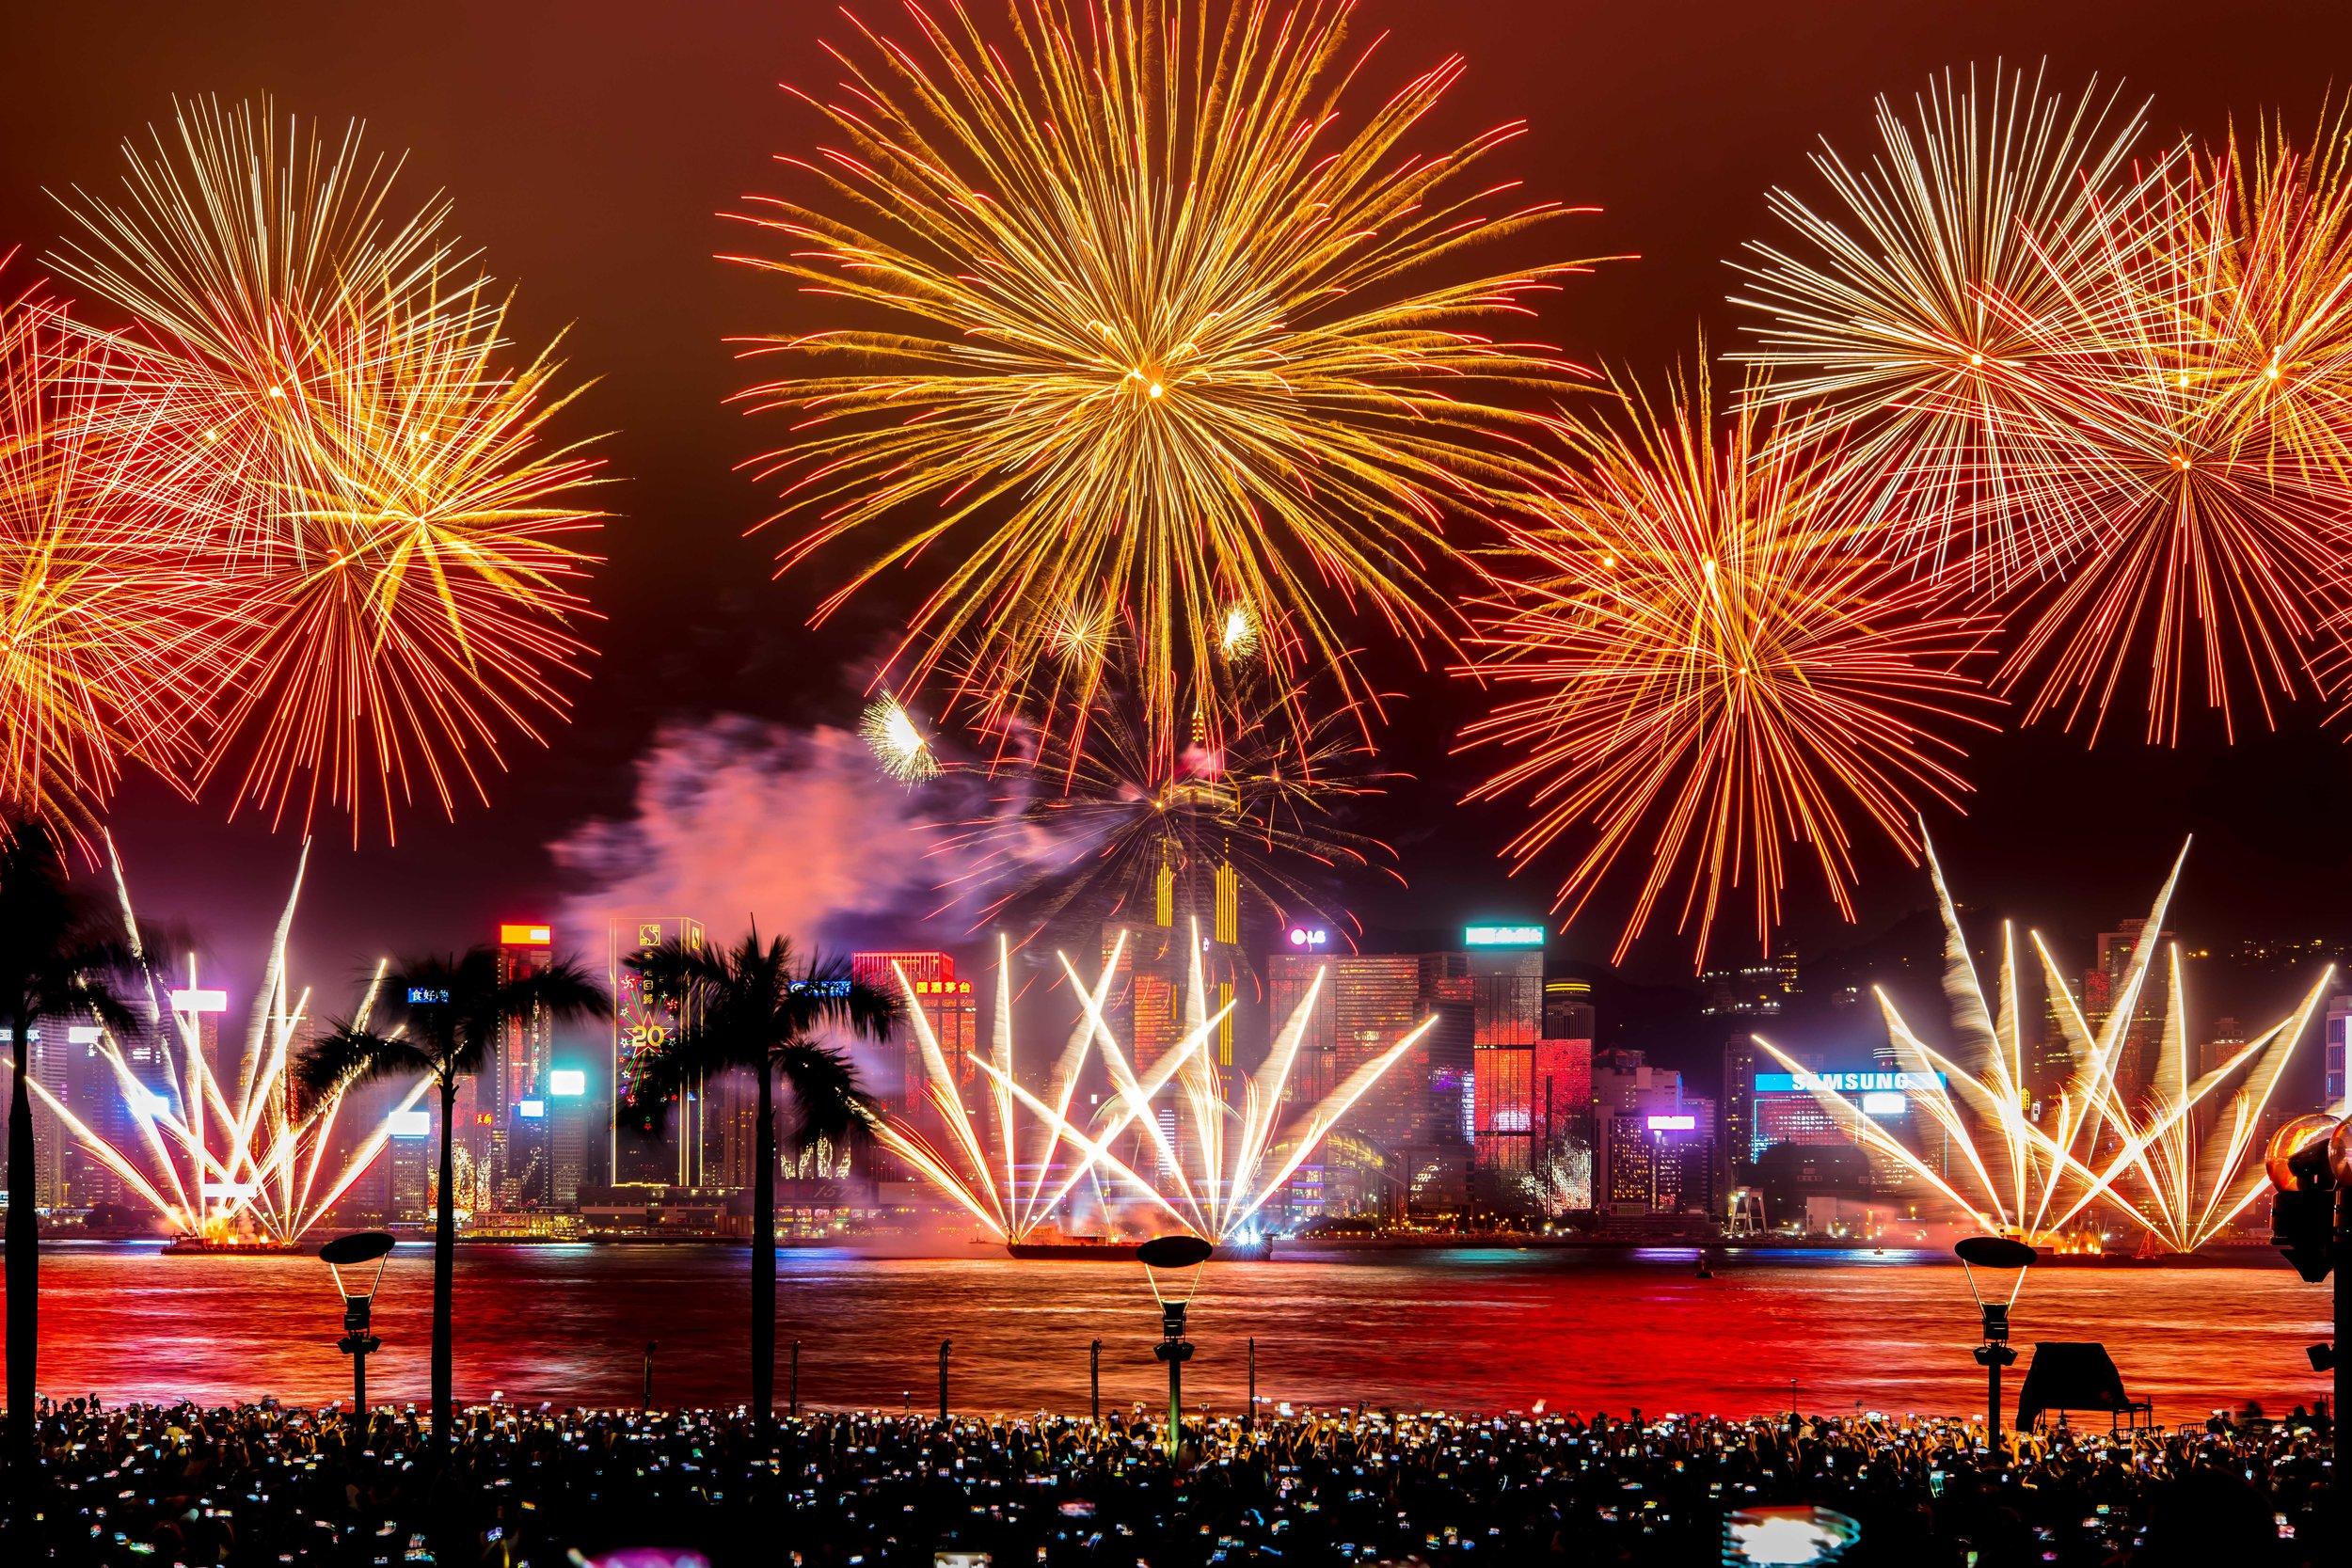 Fireworks Display 2017 #6